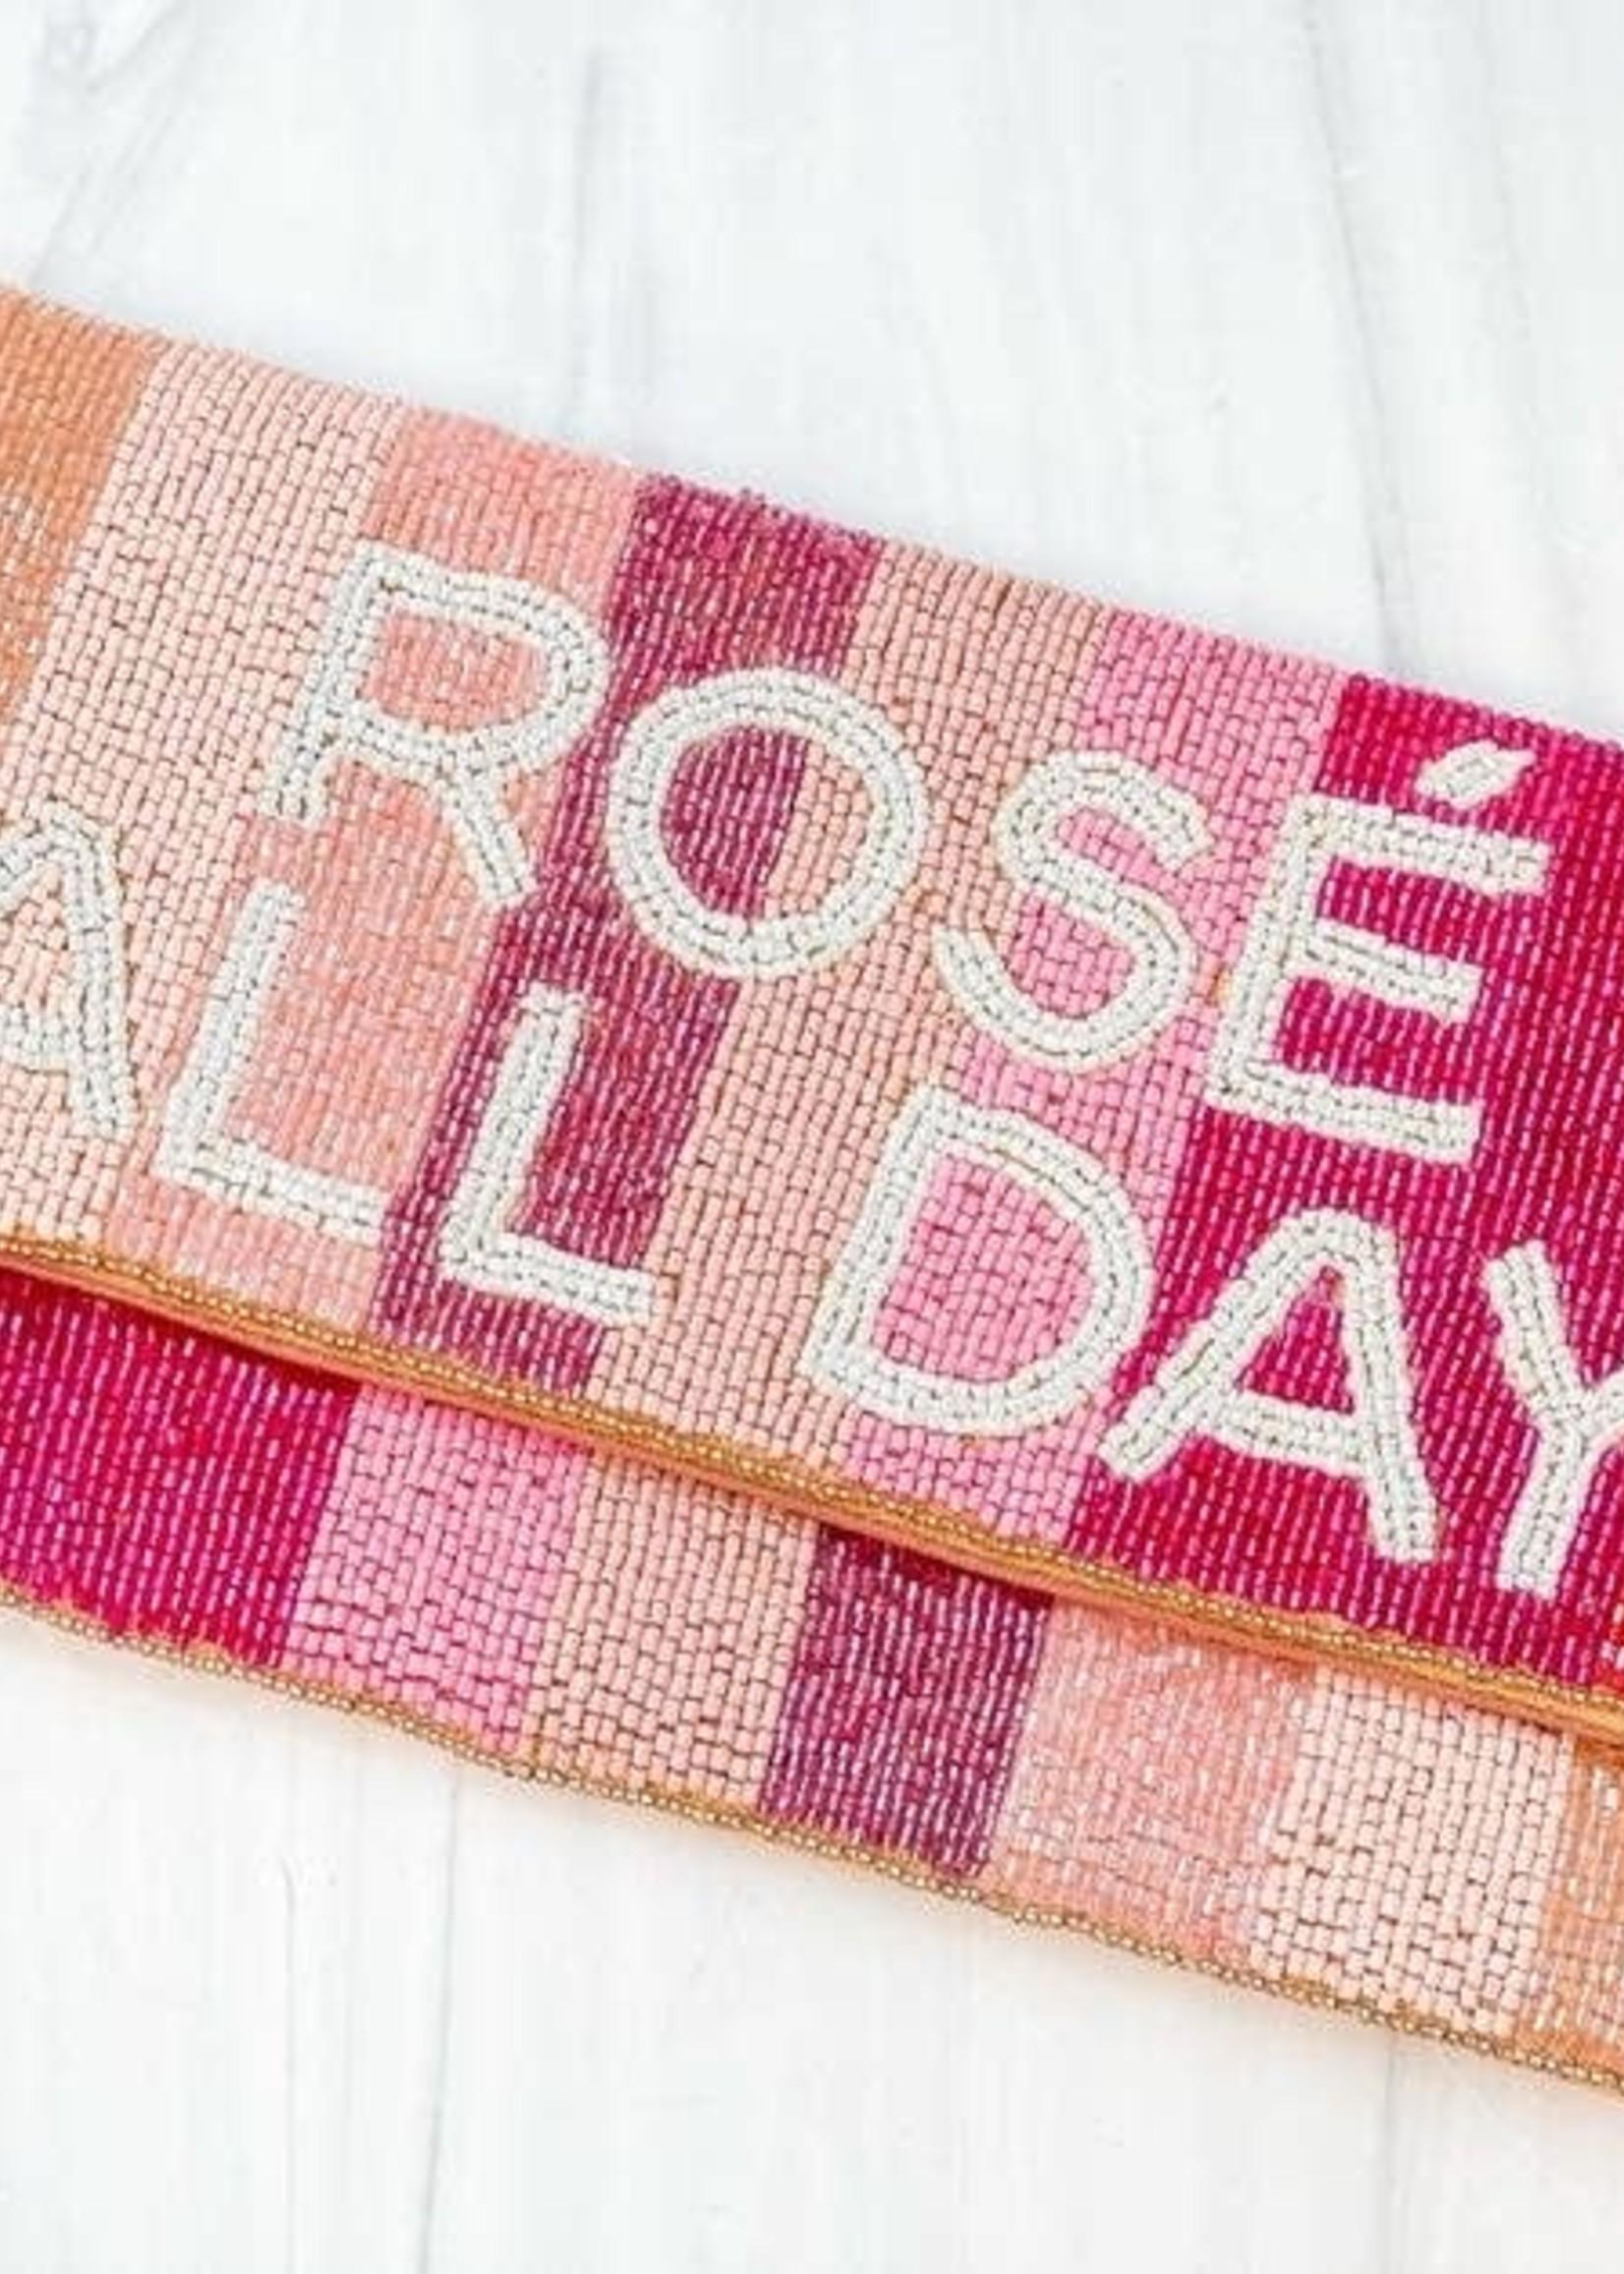 Rosé All Day Beaded Clutch Beaded Clutch/Crossbody